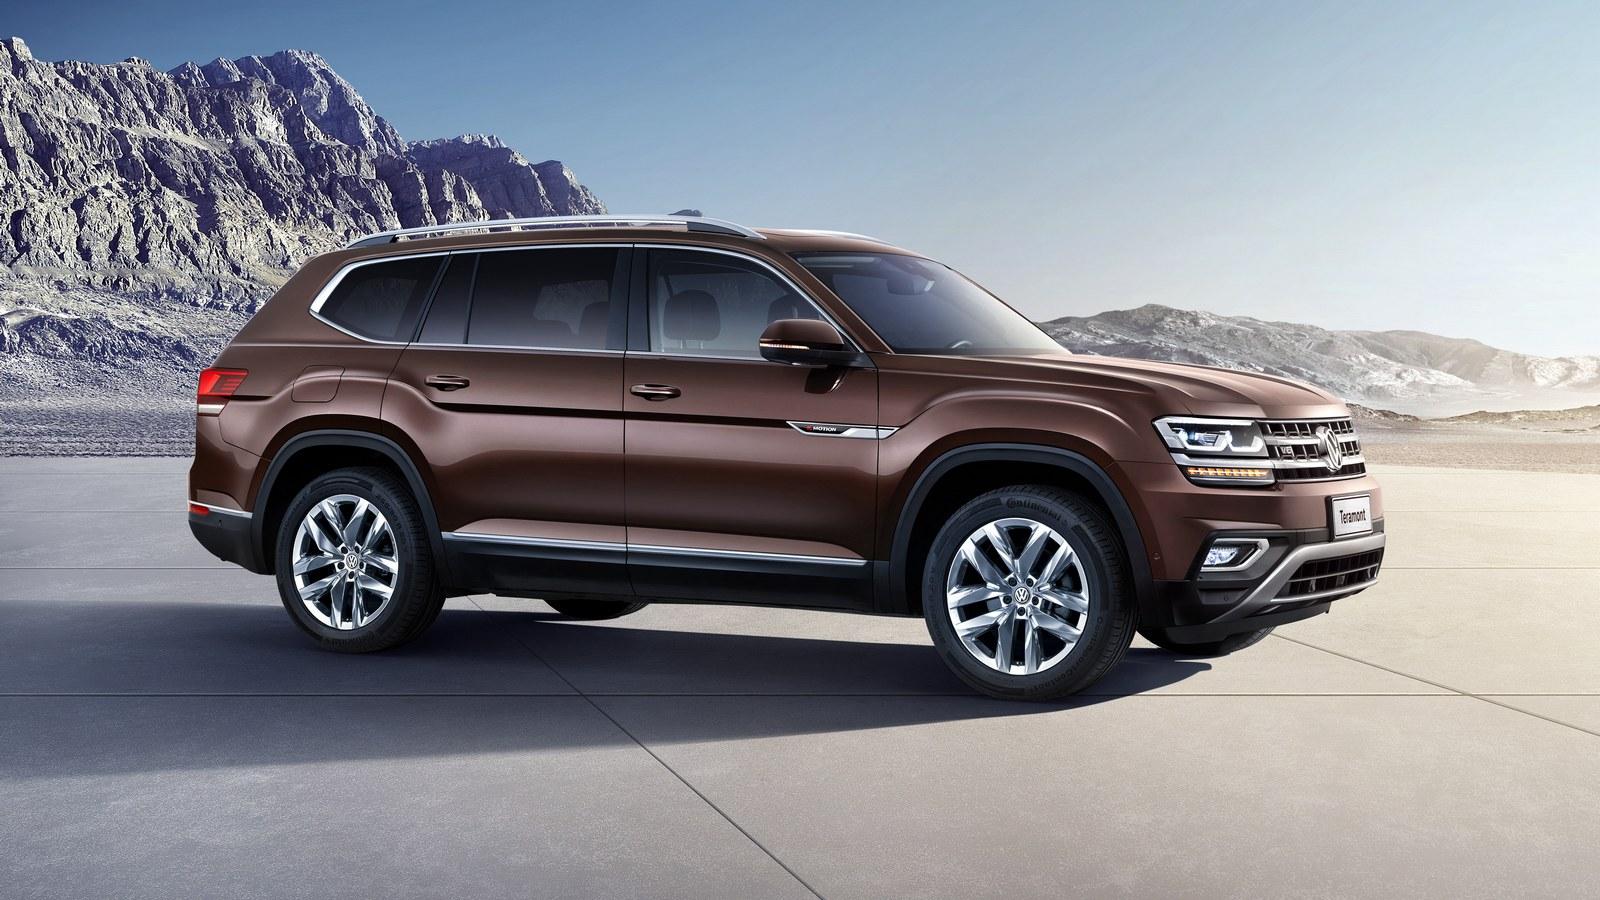 VW представил большой джип для РФ